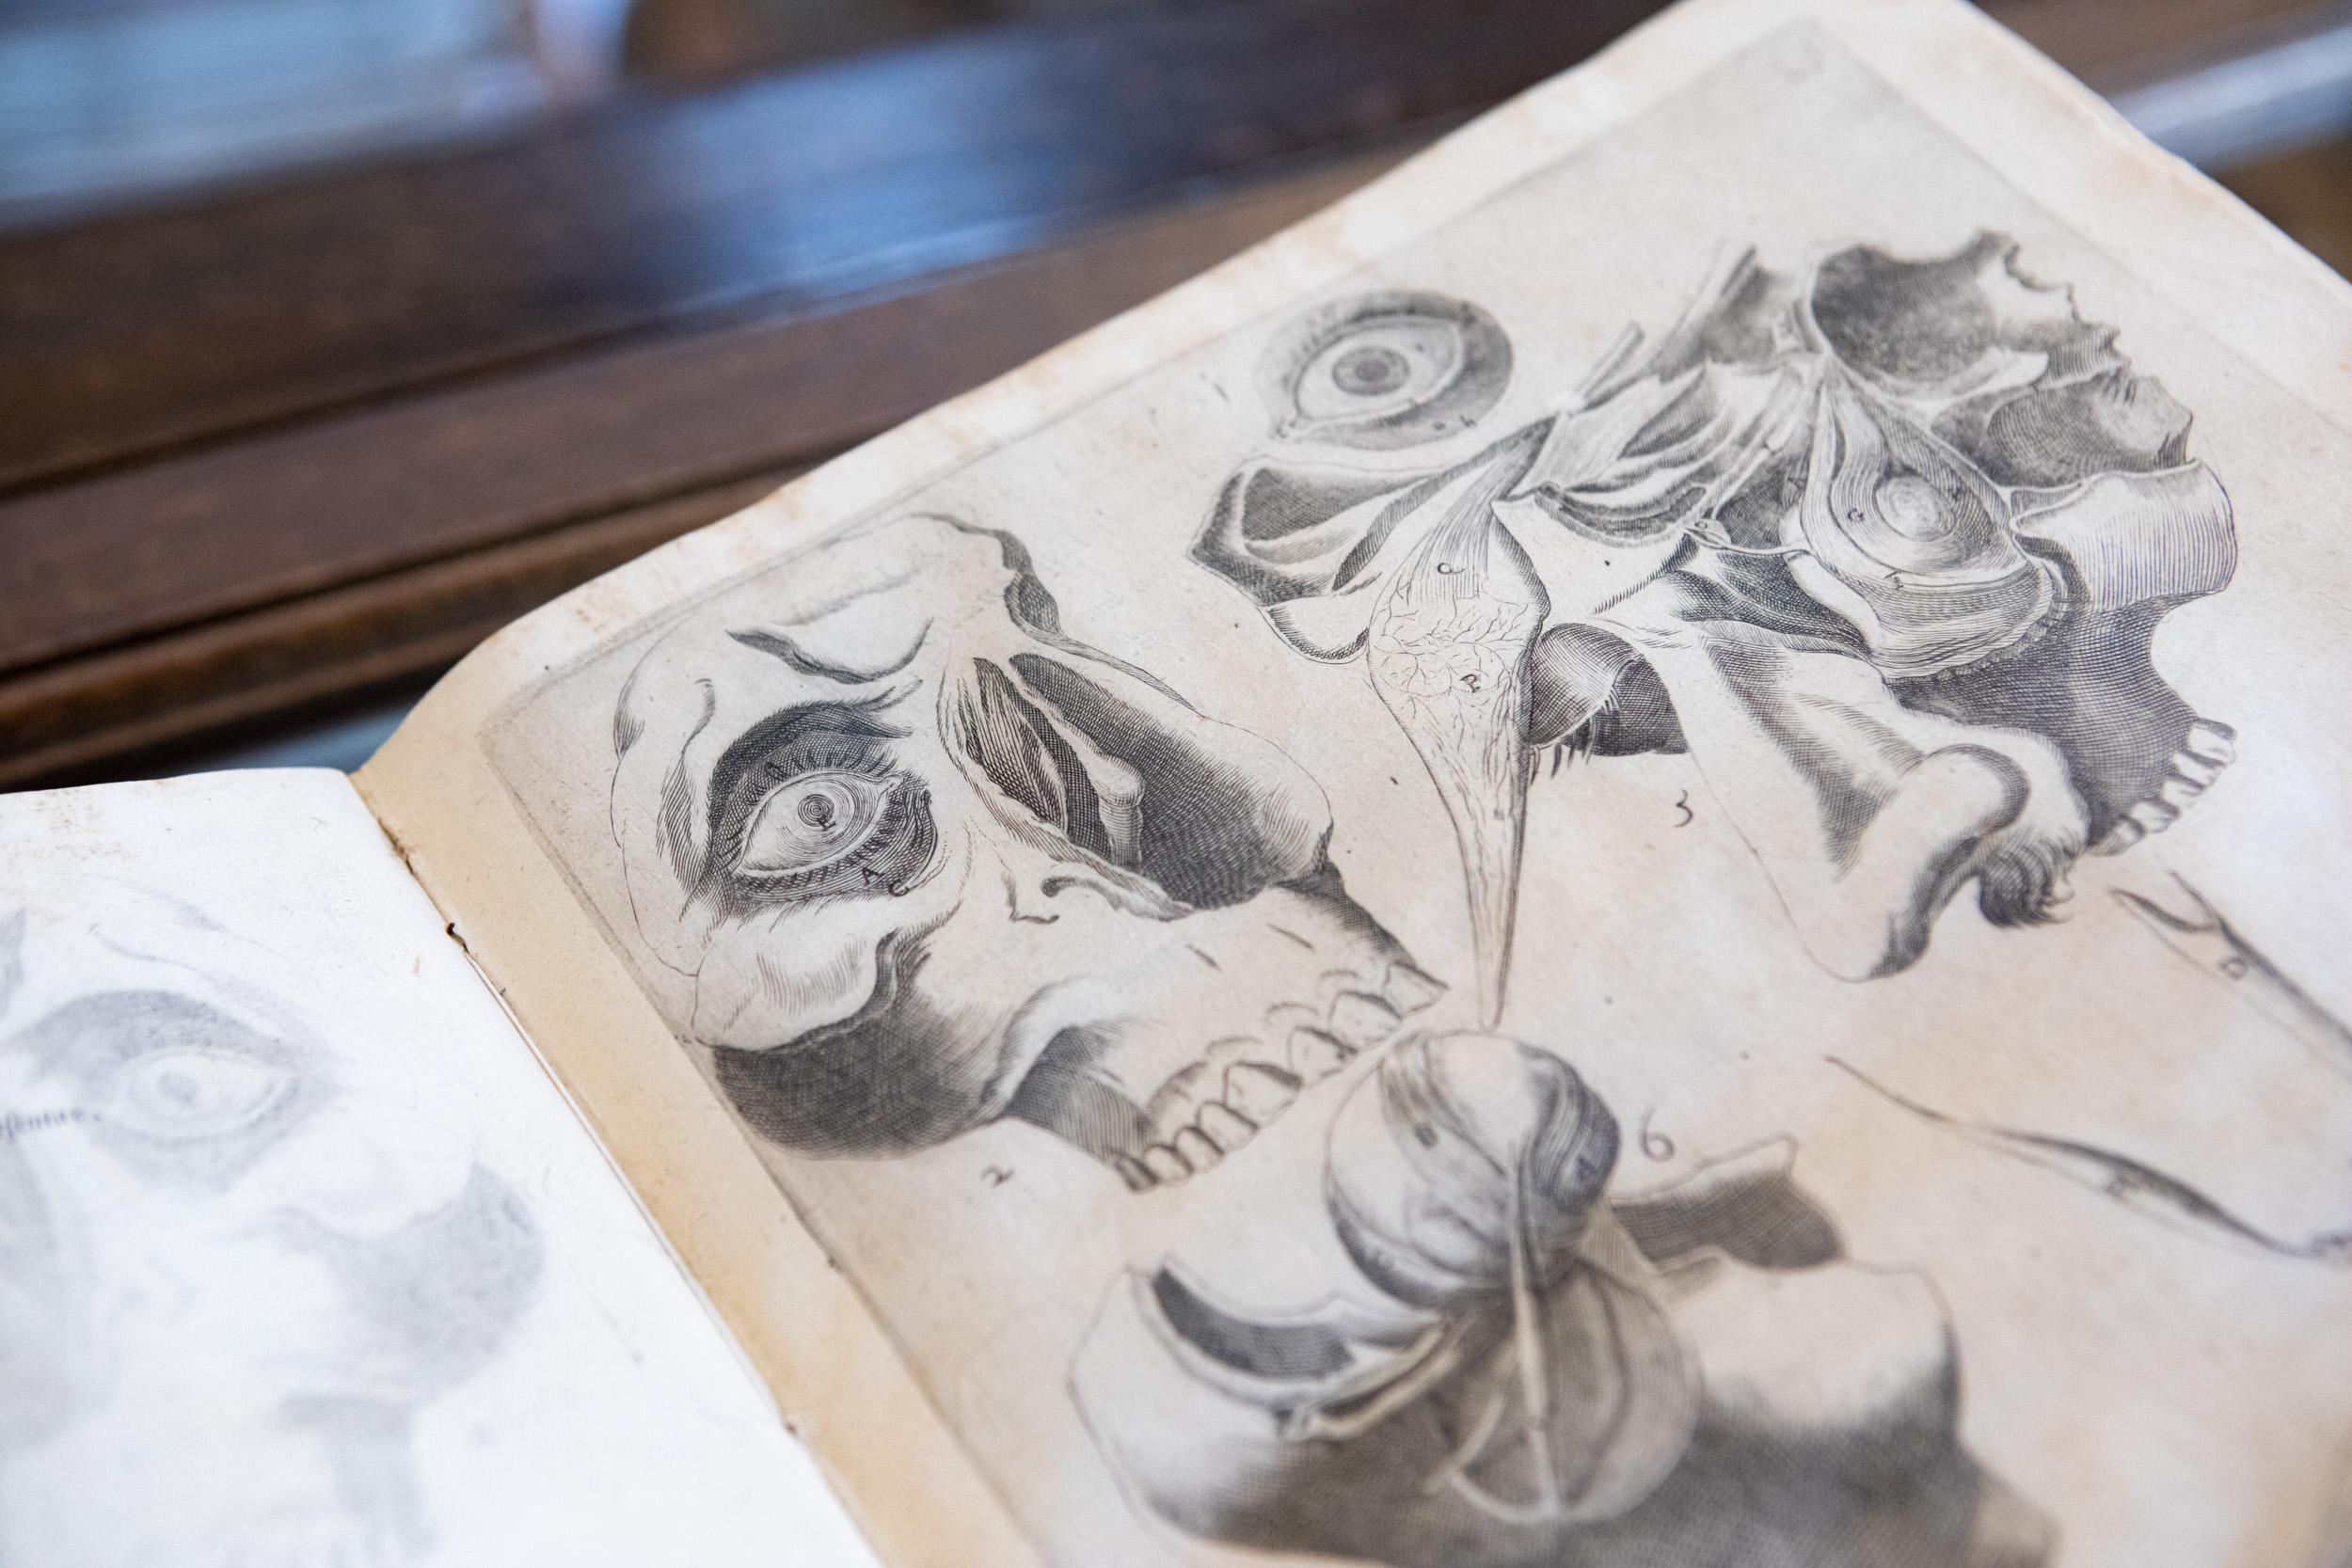 Medicina a Padova nei secoli: Fabrici d'Acquapendente, quando l'anatomia incontra l'arte 360a1915